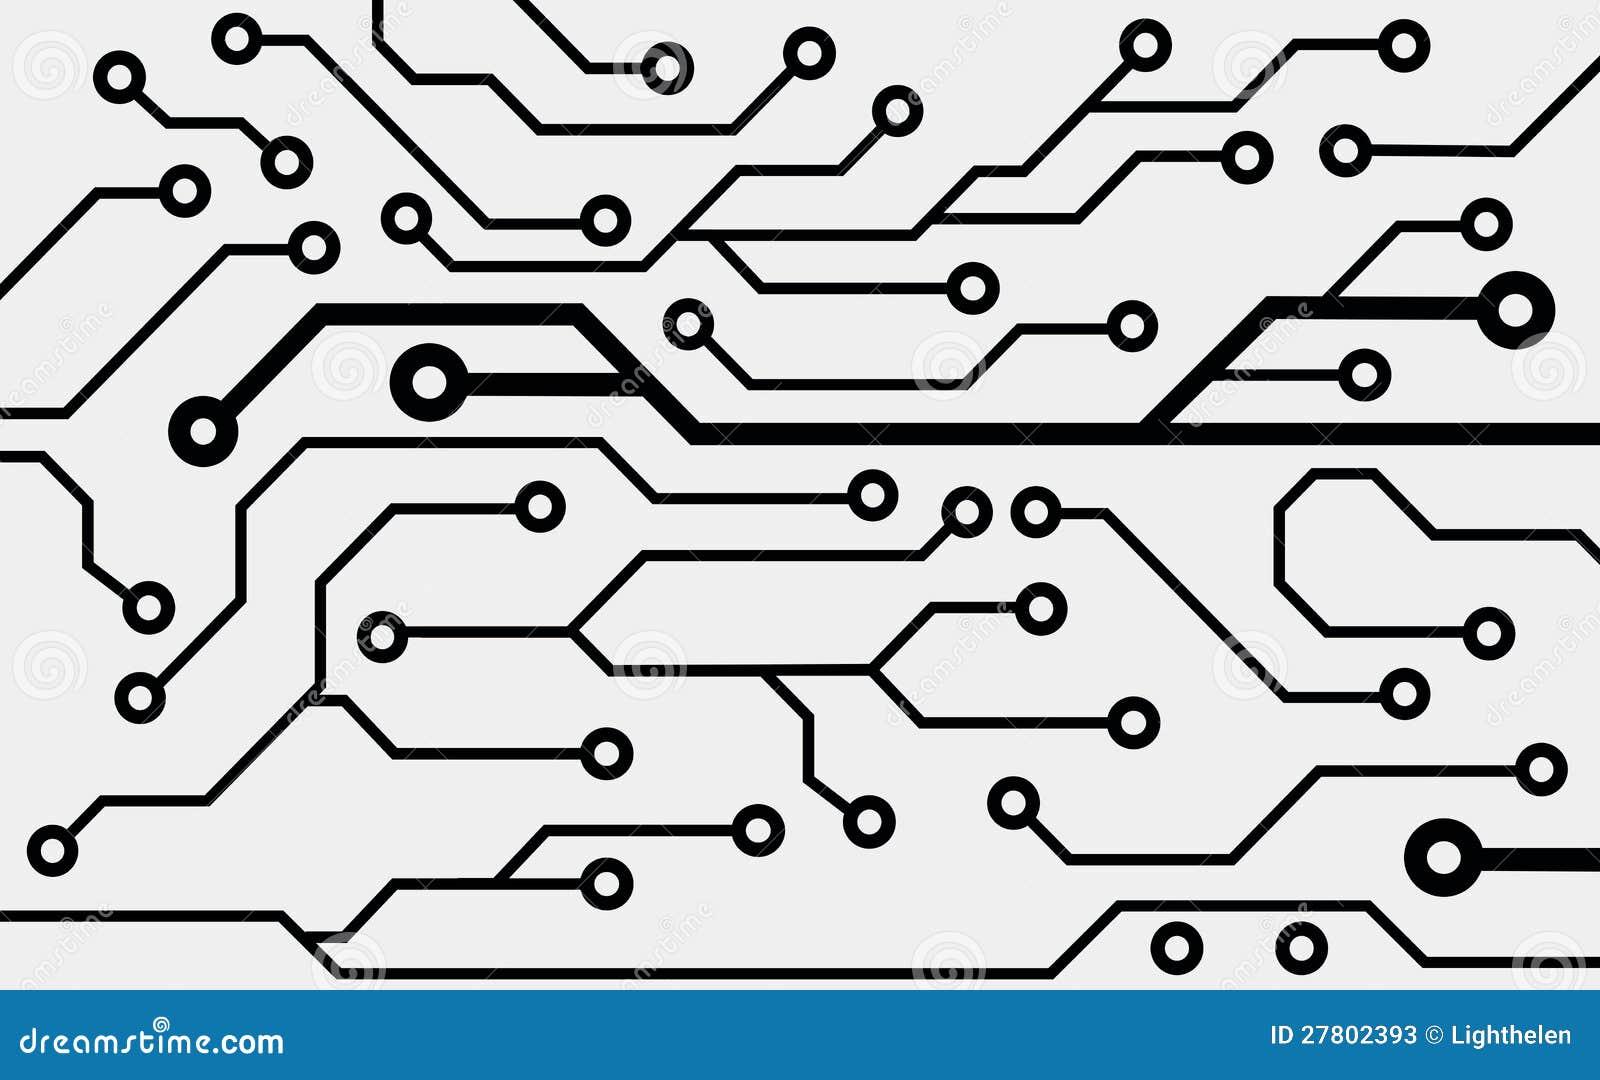 tarjeta de circuitos de ordenador stock de ilustraci u00f3n